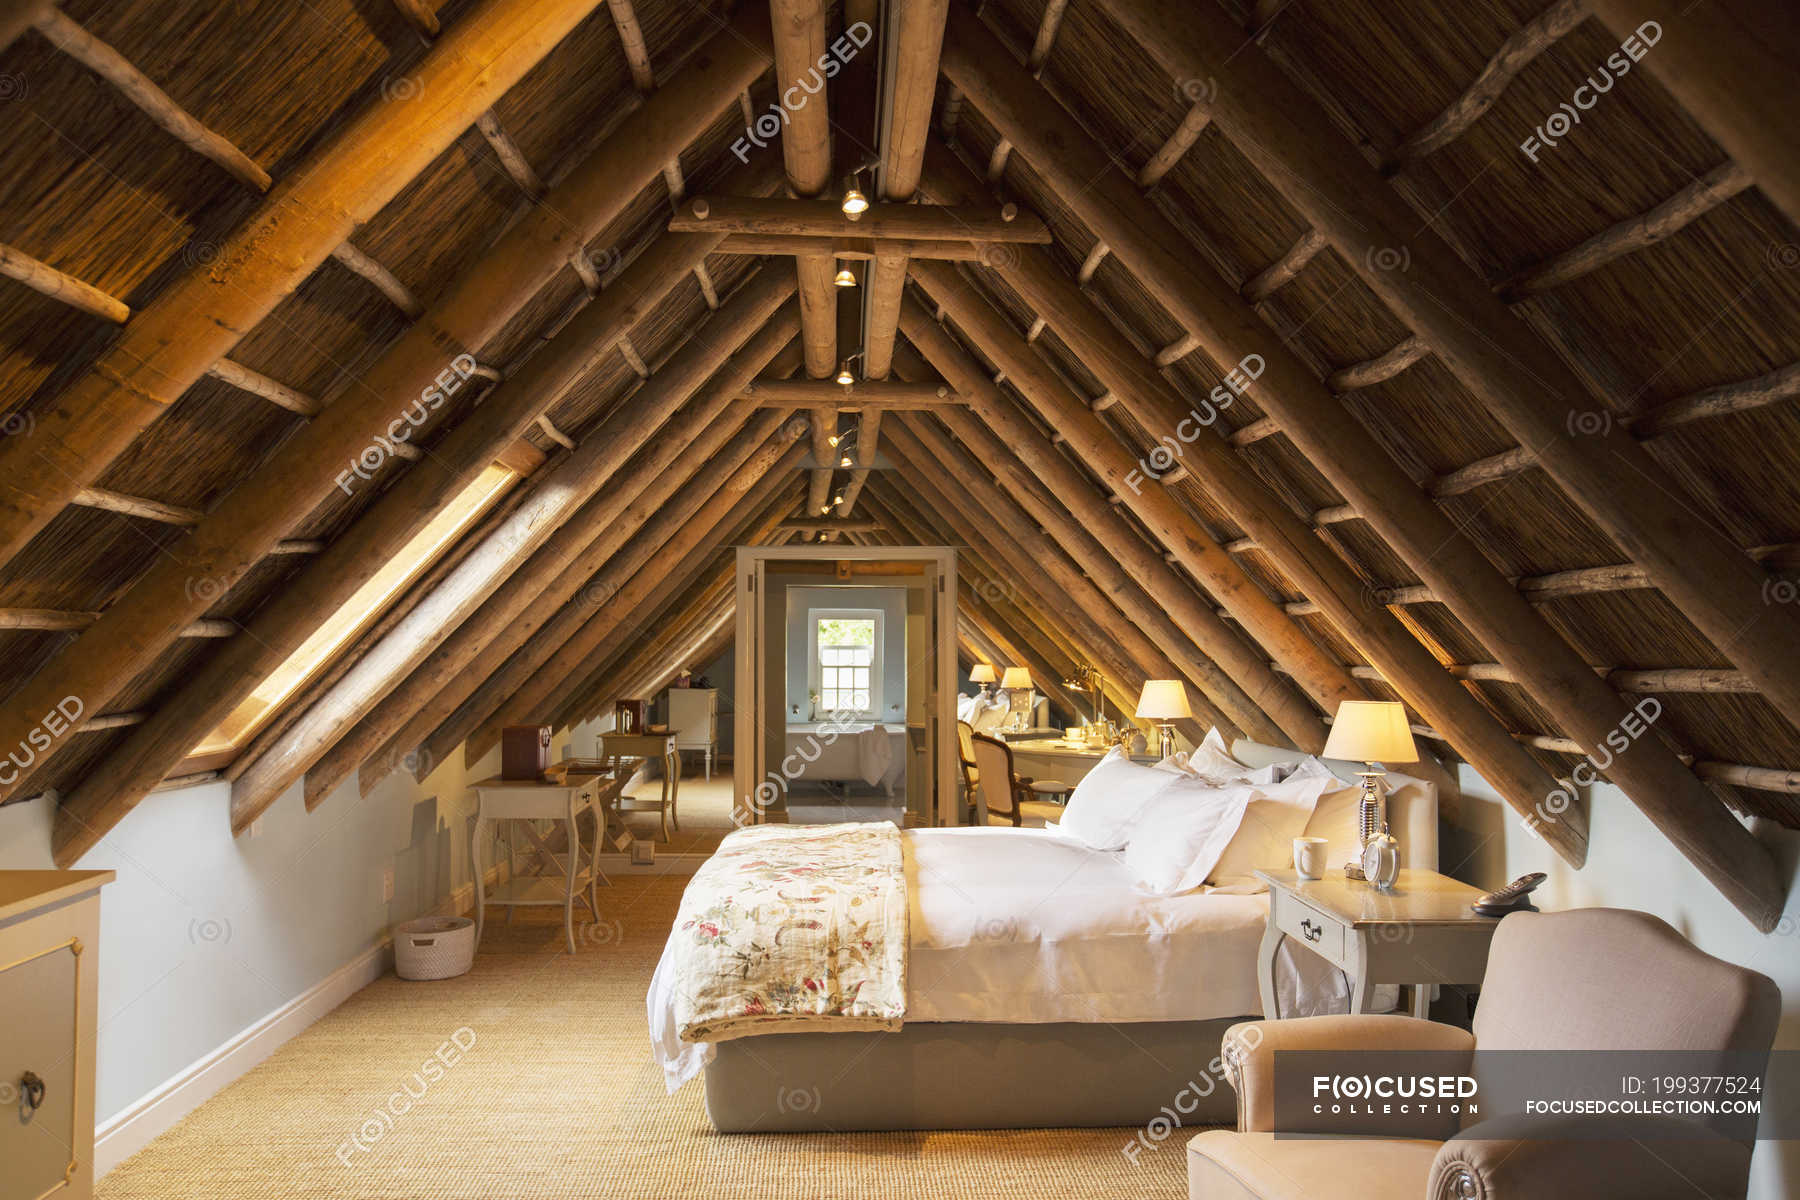 Luxury Attic Bedroom Under Wooden Roof Backdrop Interior Design Stock Photo 199377524